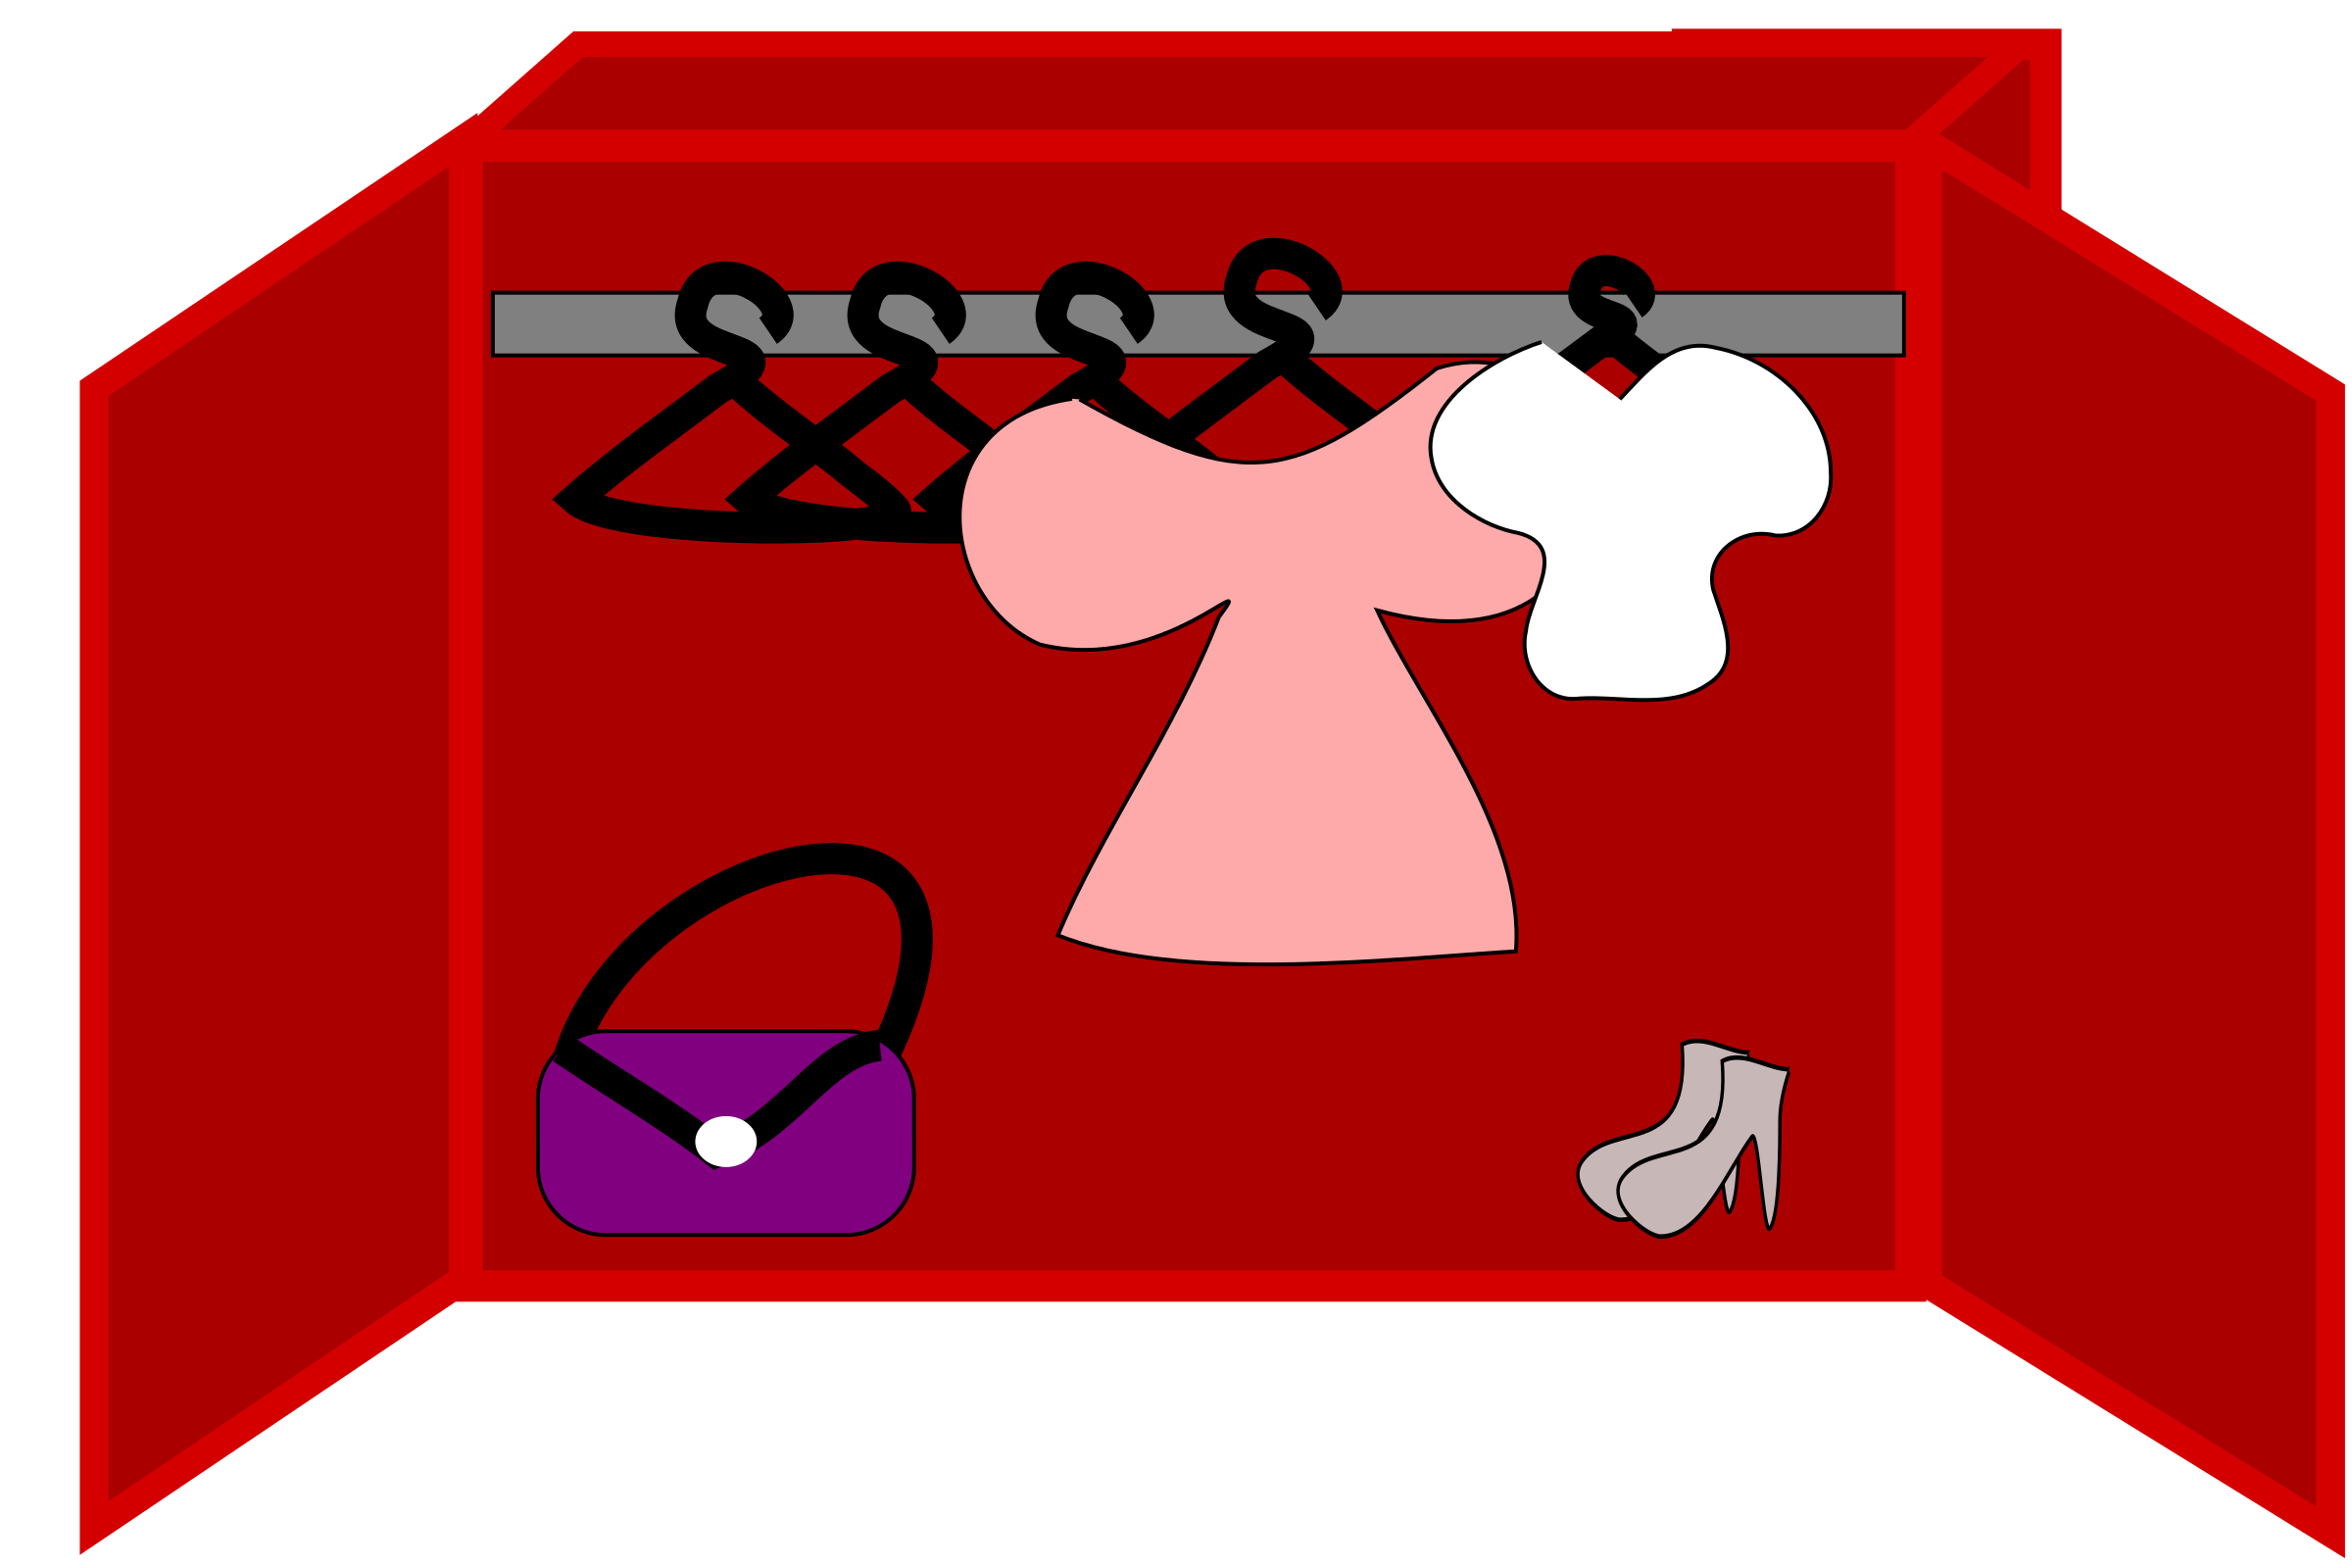 Closet clip art free. Clothes clipart sleep